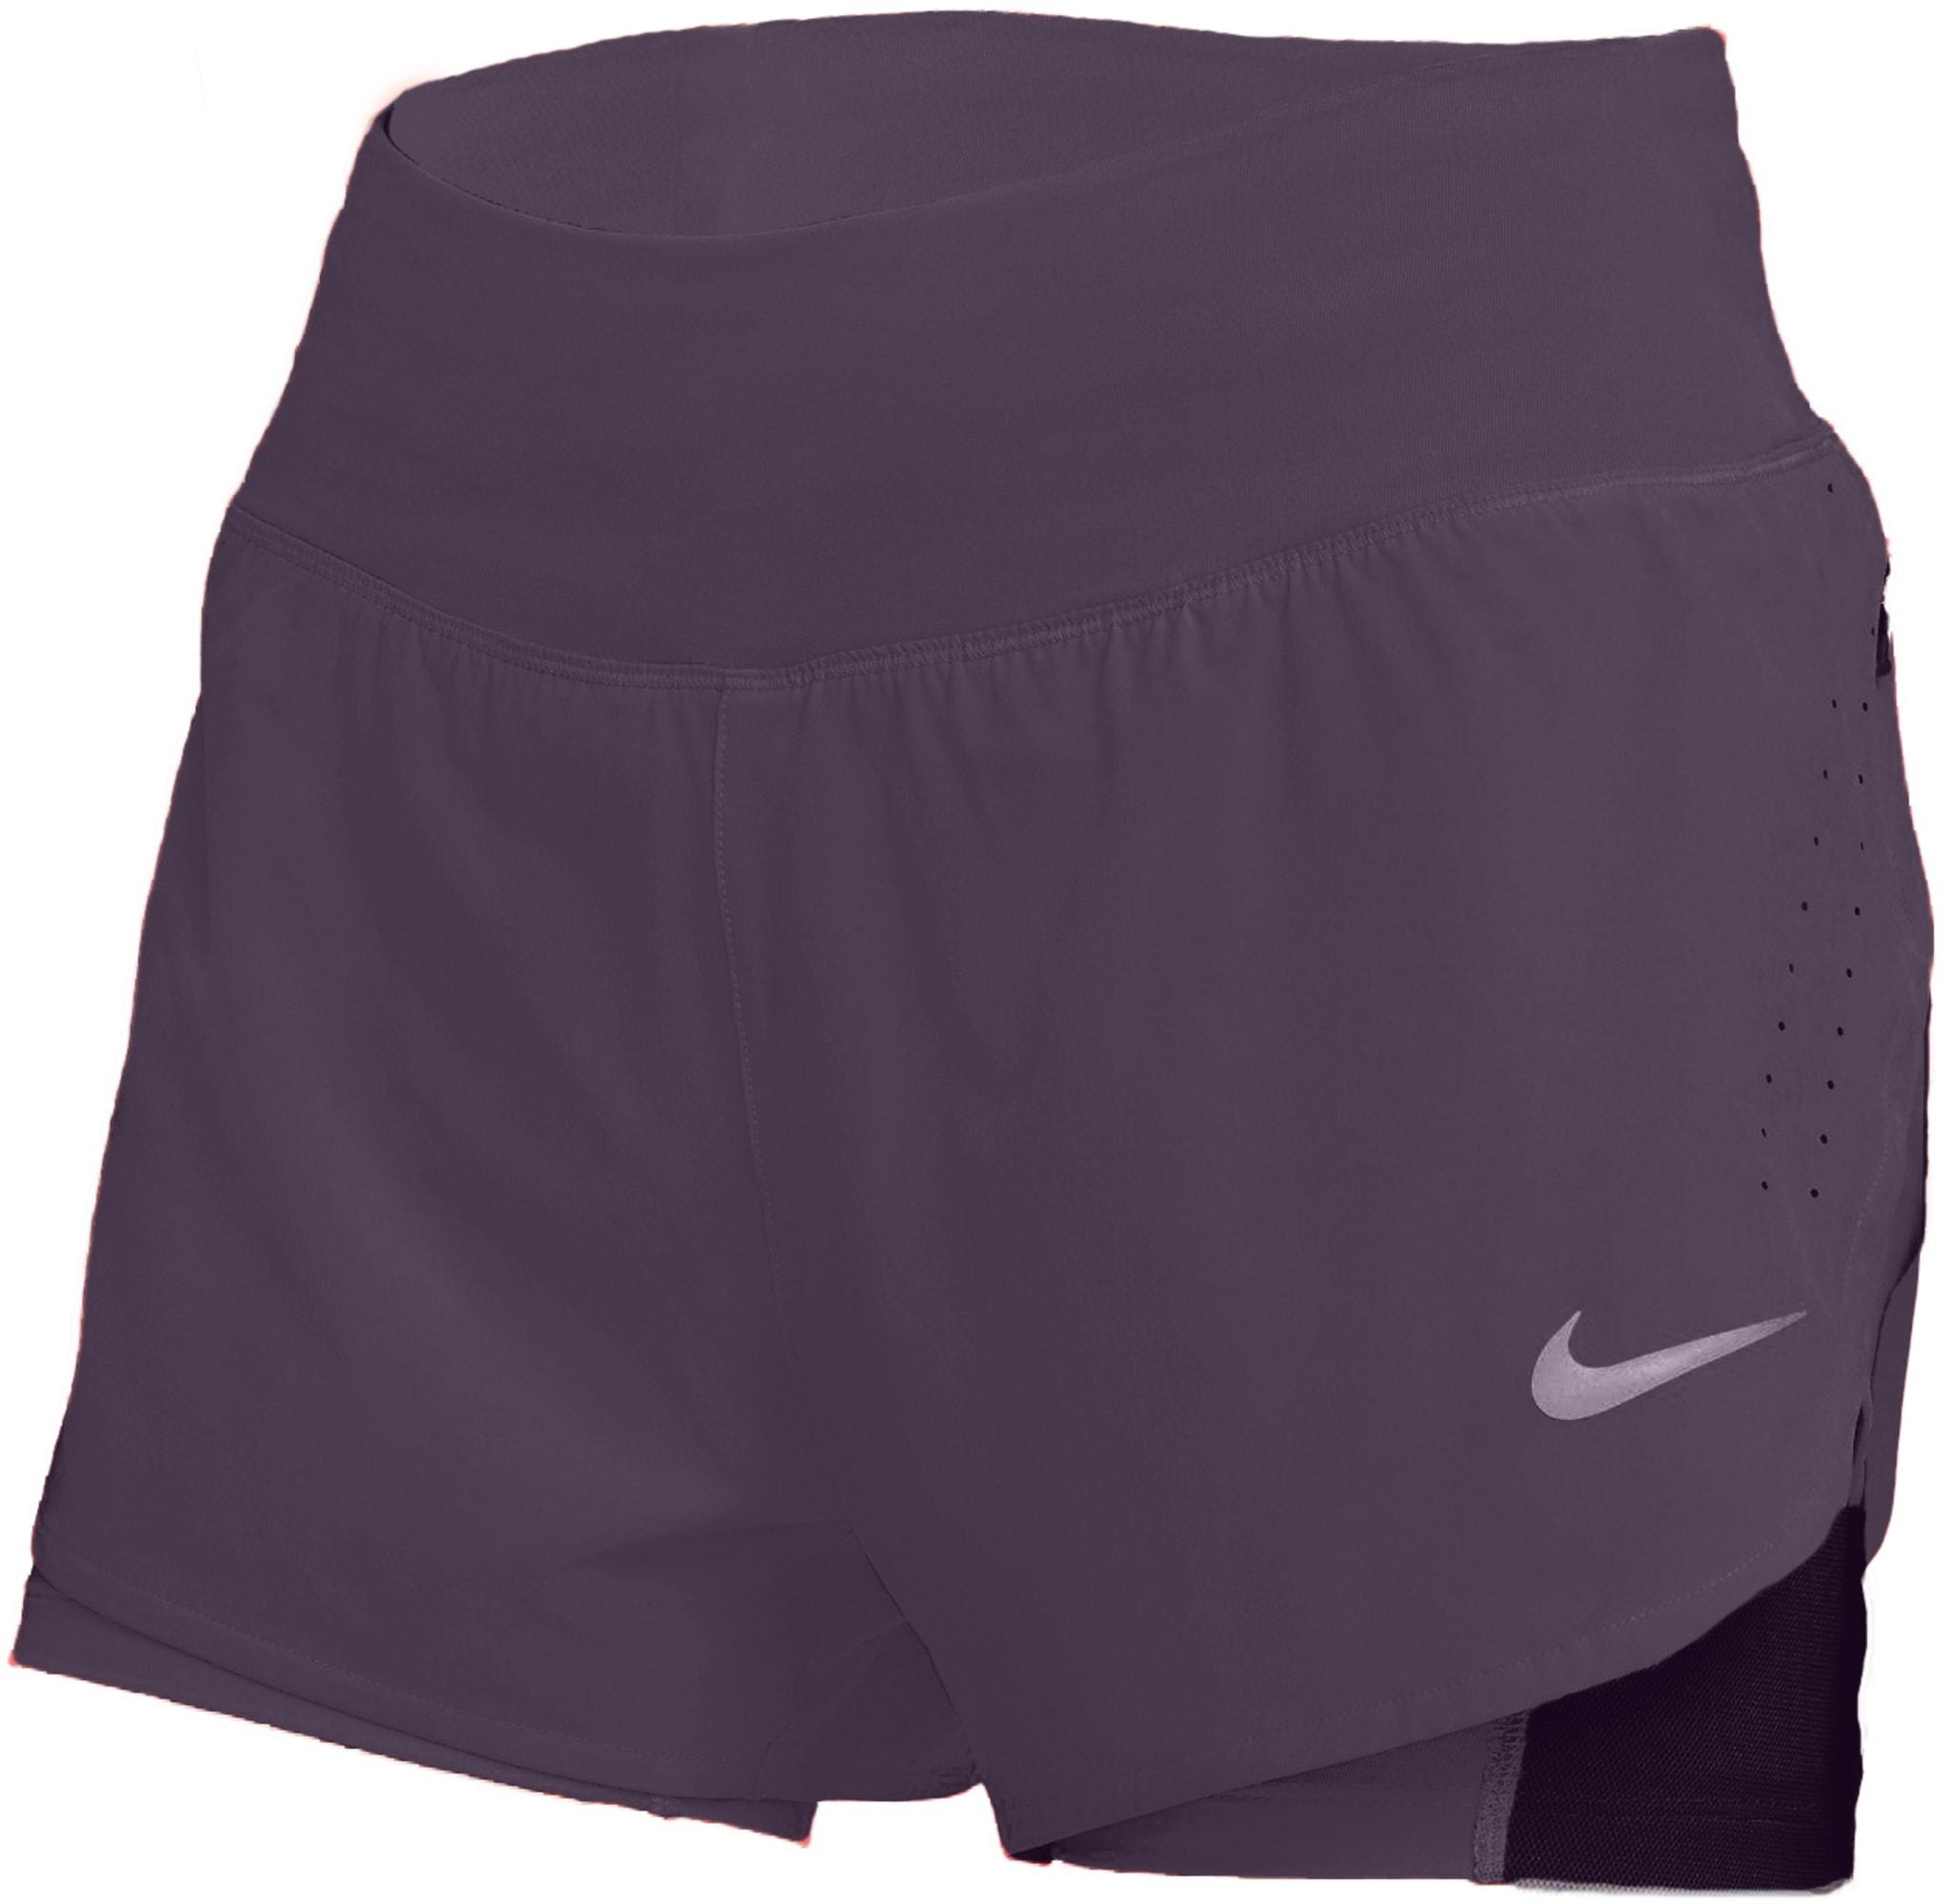 Eclipse 2-In-1 Running Shorts W